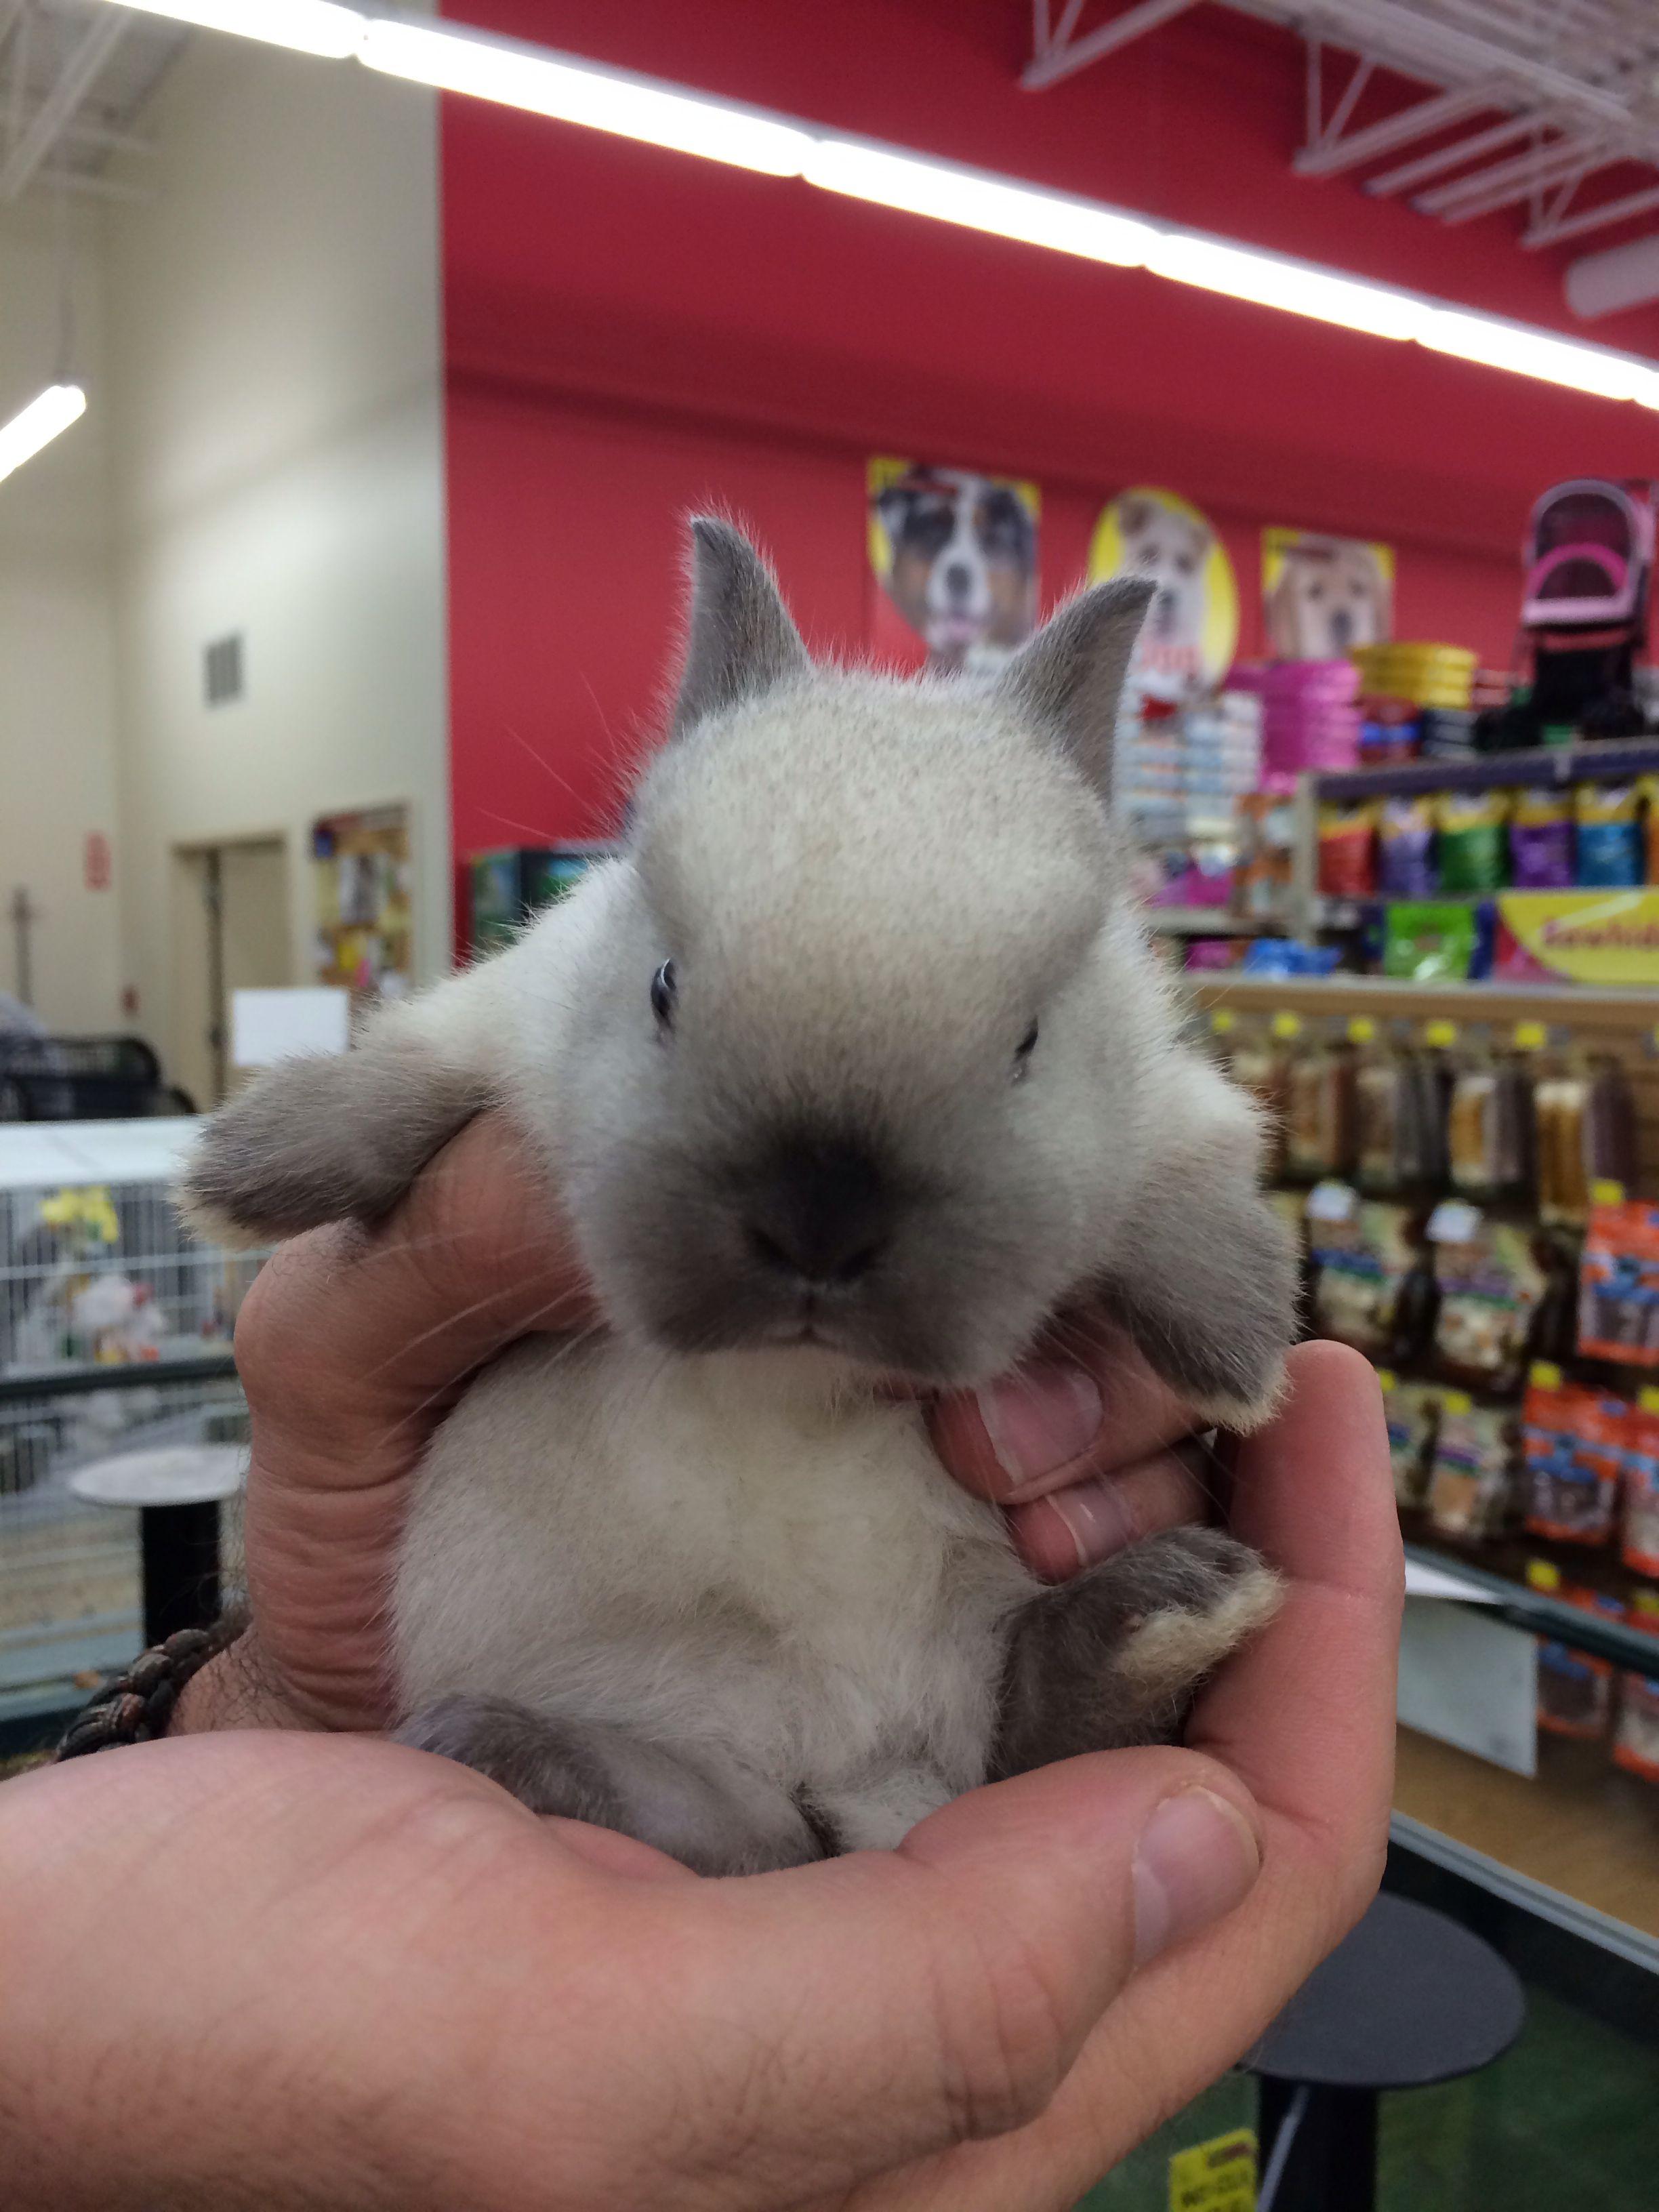 Pet Store Dwarf Baby Bunny Dwarf Baby Baby Bunnies Pet Store